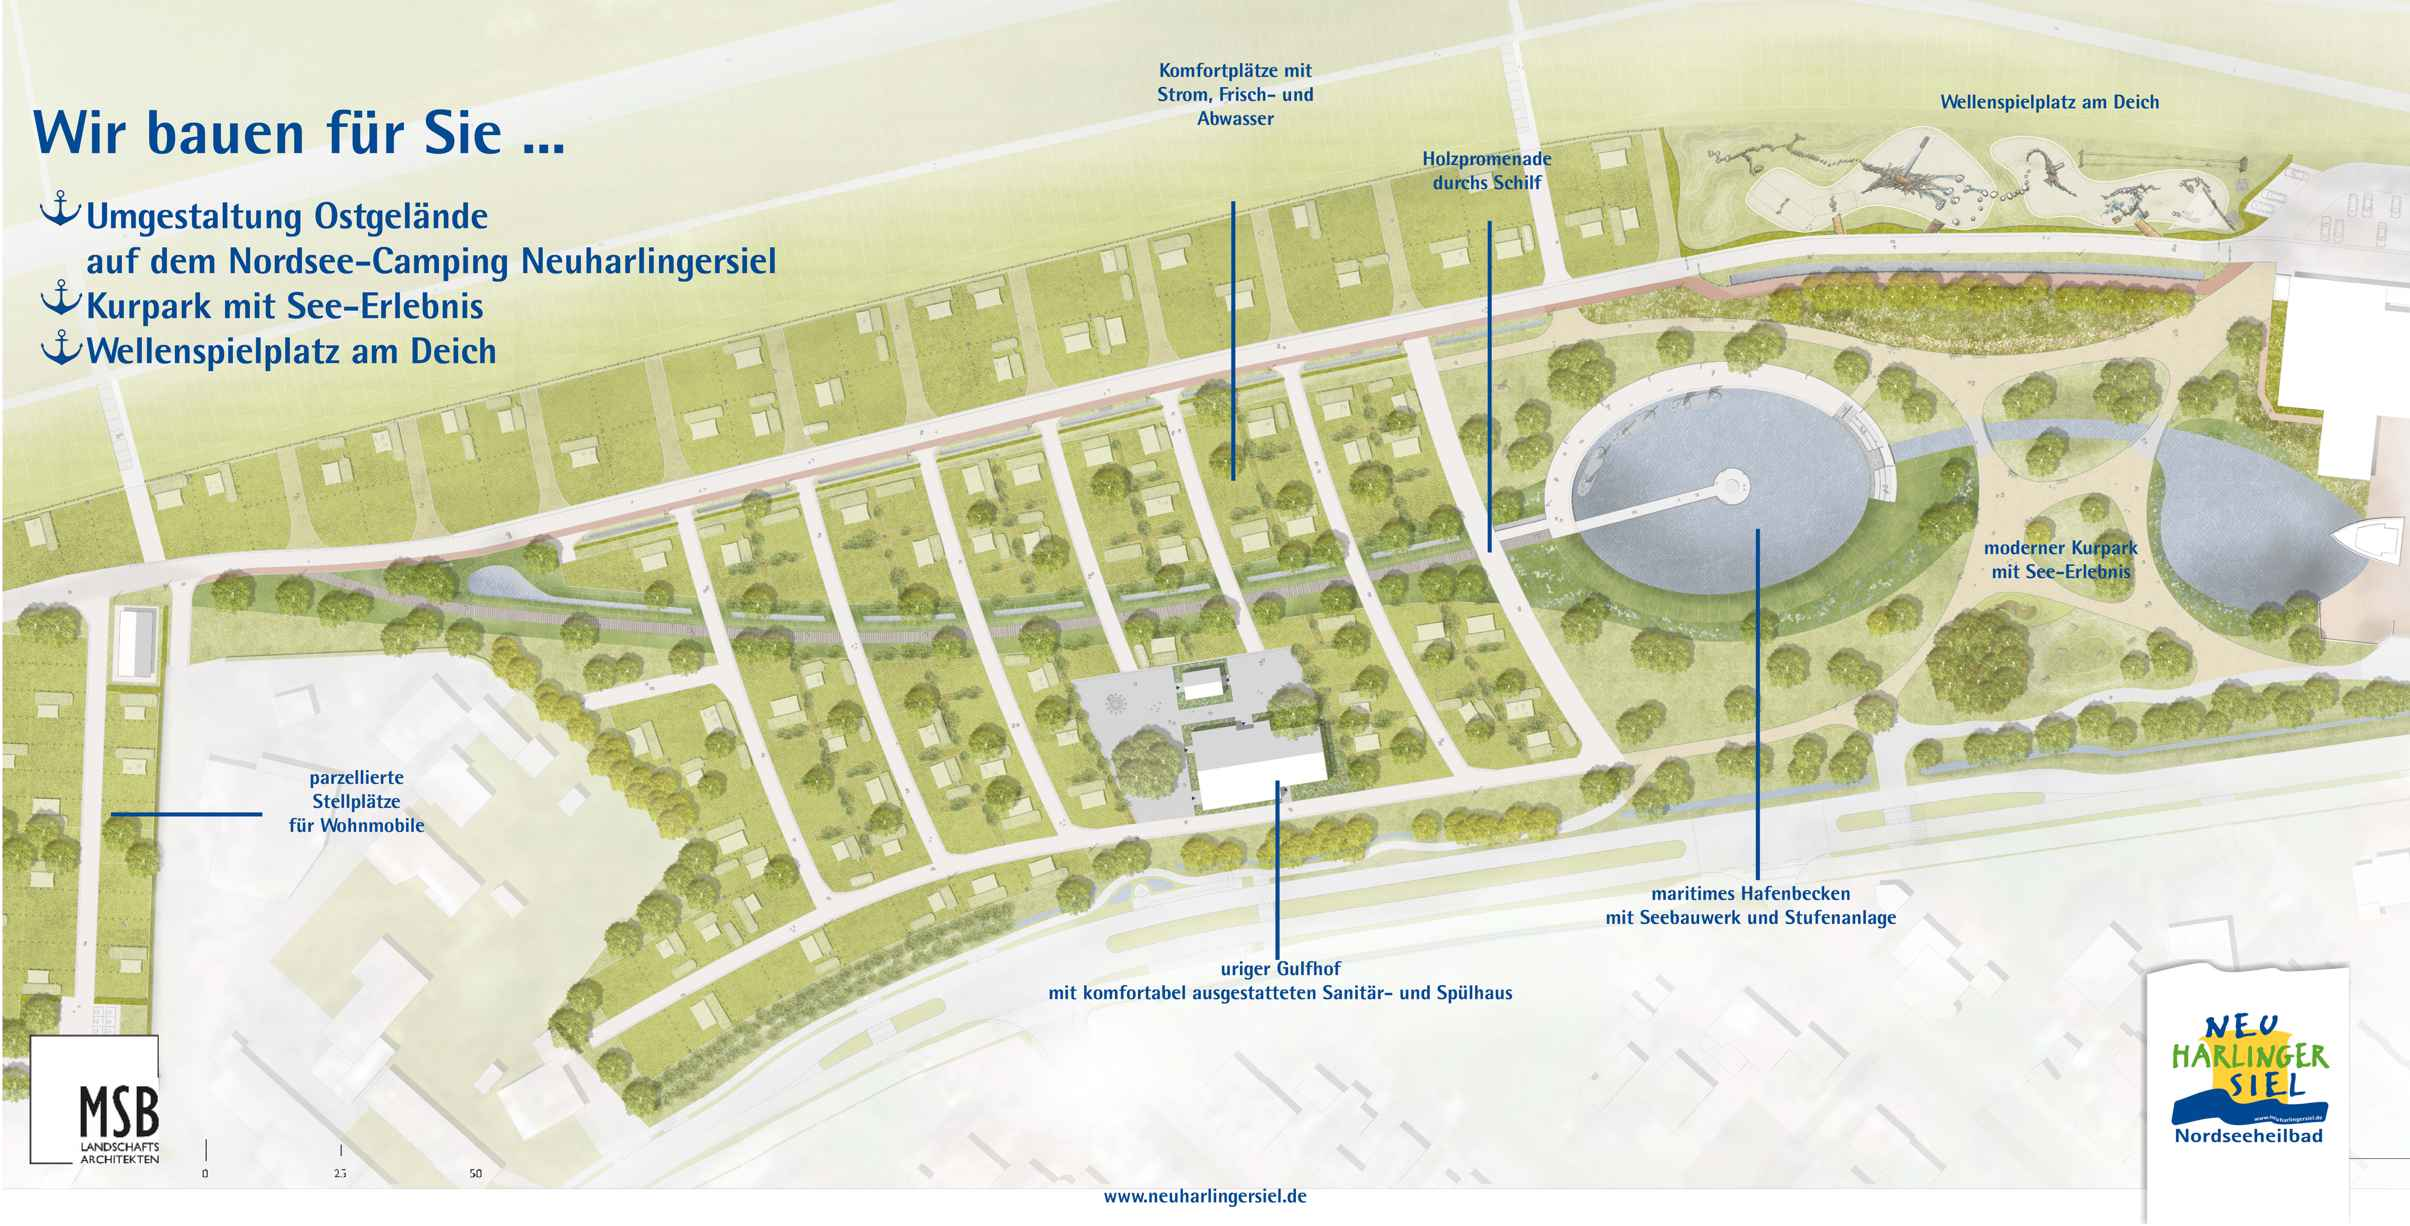 Umgestaltung Nordsee-Campingplatz Neuharlingersiel